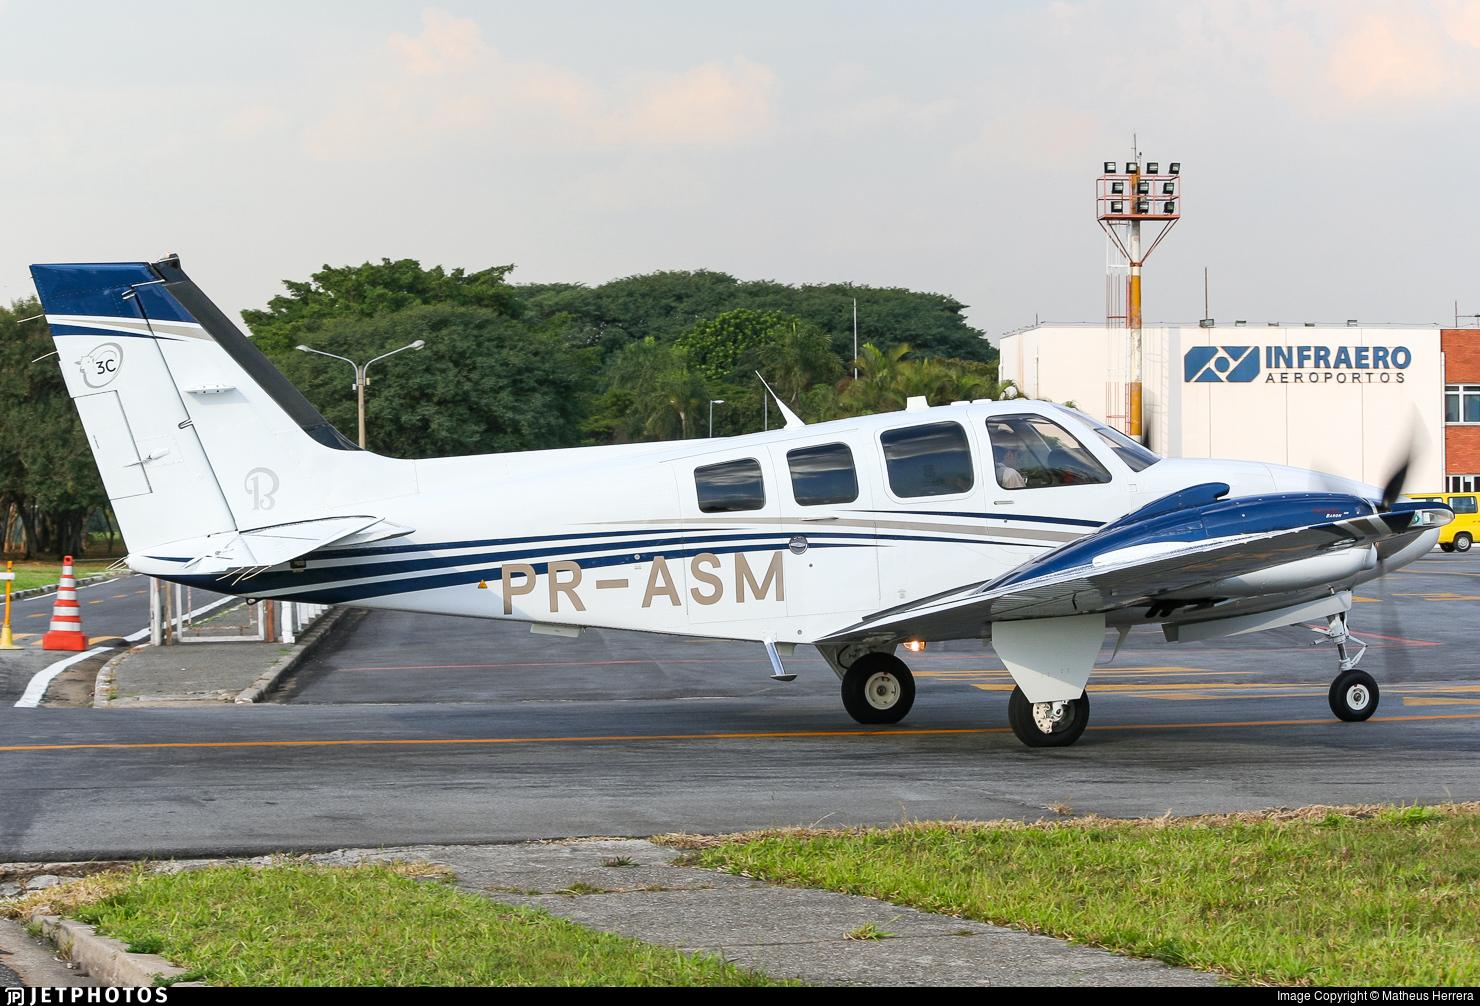 PR-ASM - Beechcraft G58 Baron - Private